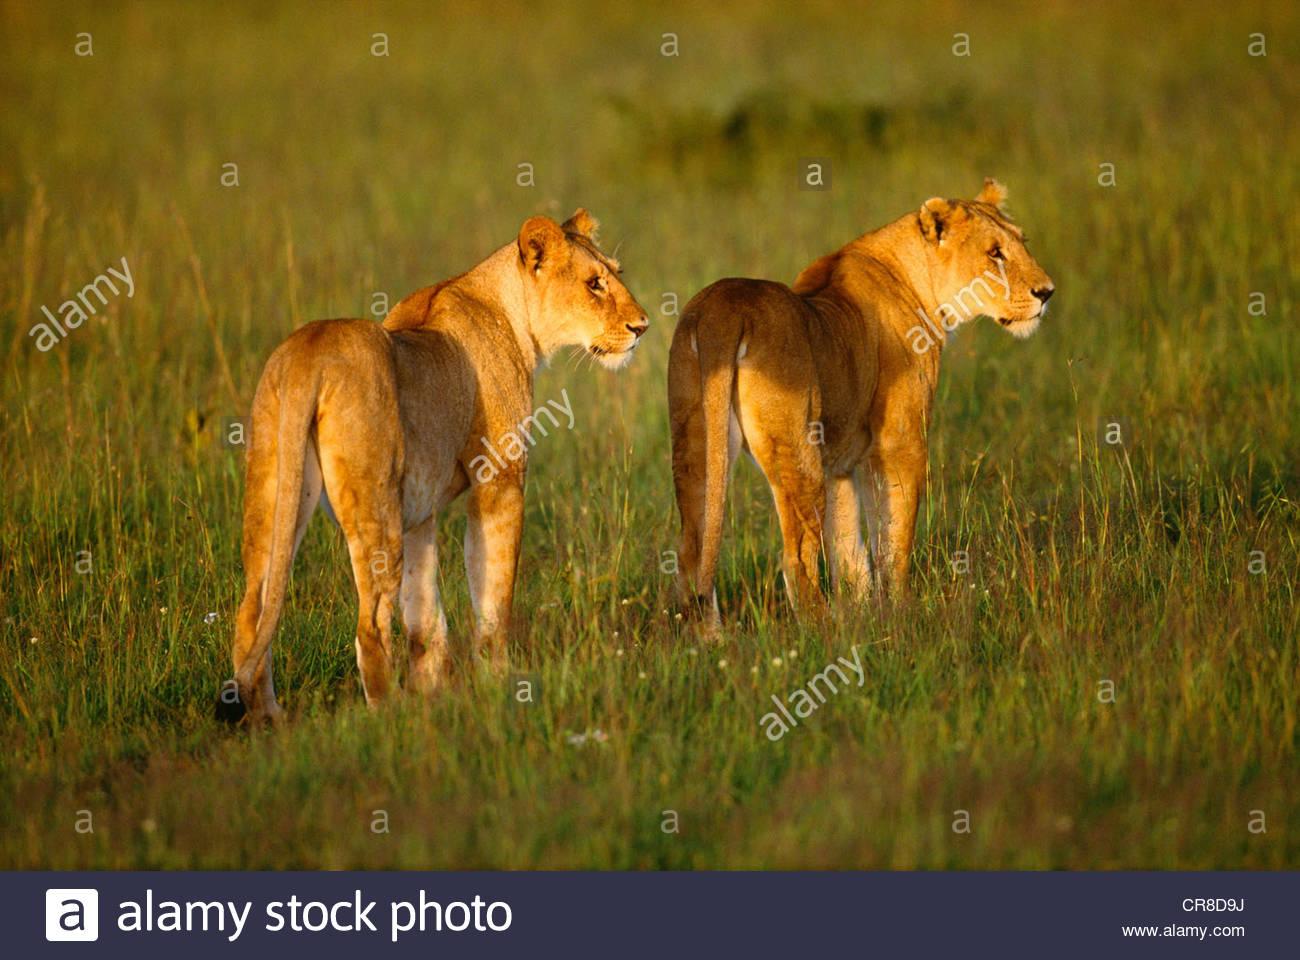 Pair of female lions, Masai Mara National Reserve, Kenya - Stock Image